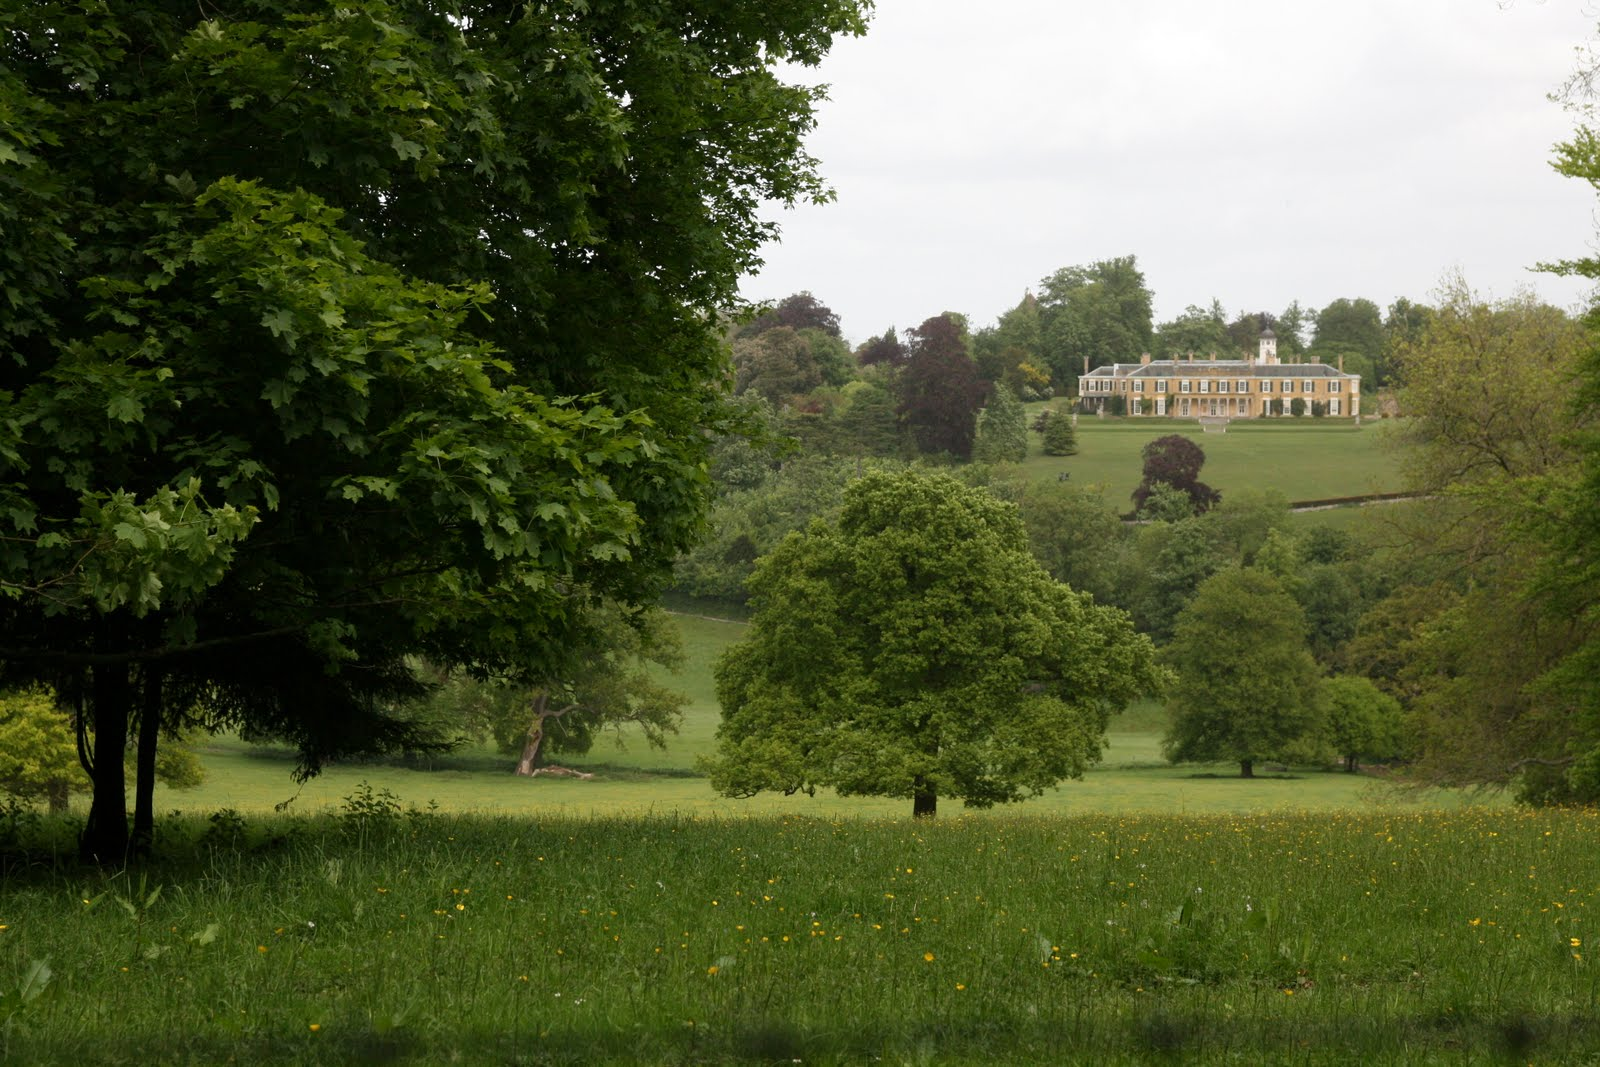 0905 052 Polesden Lacey Estate, Surrey, England Polesden Lacey